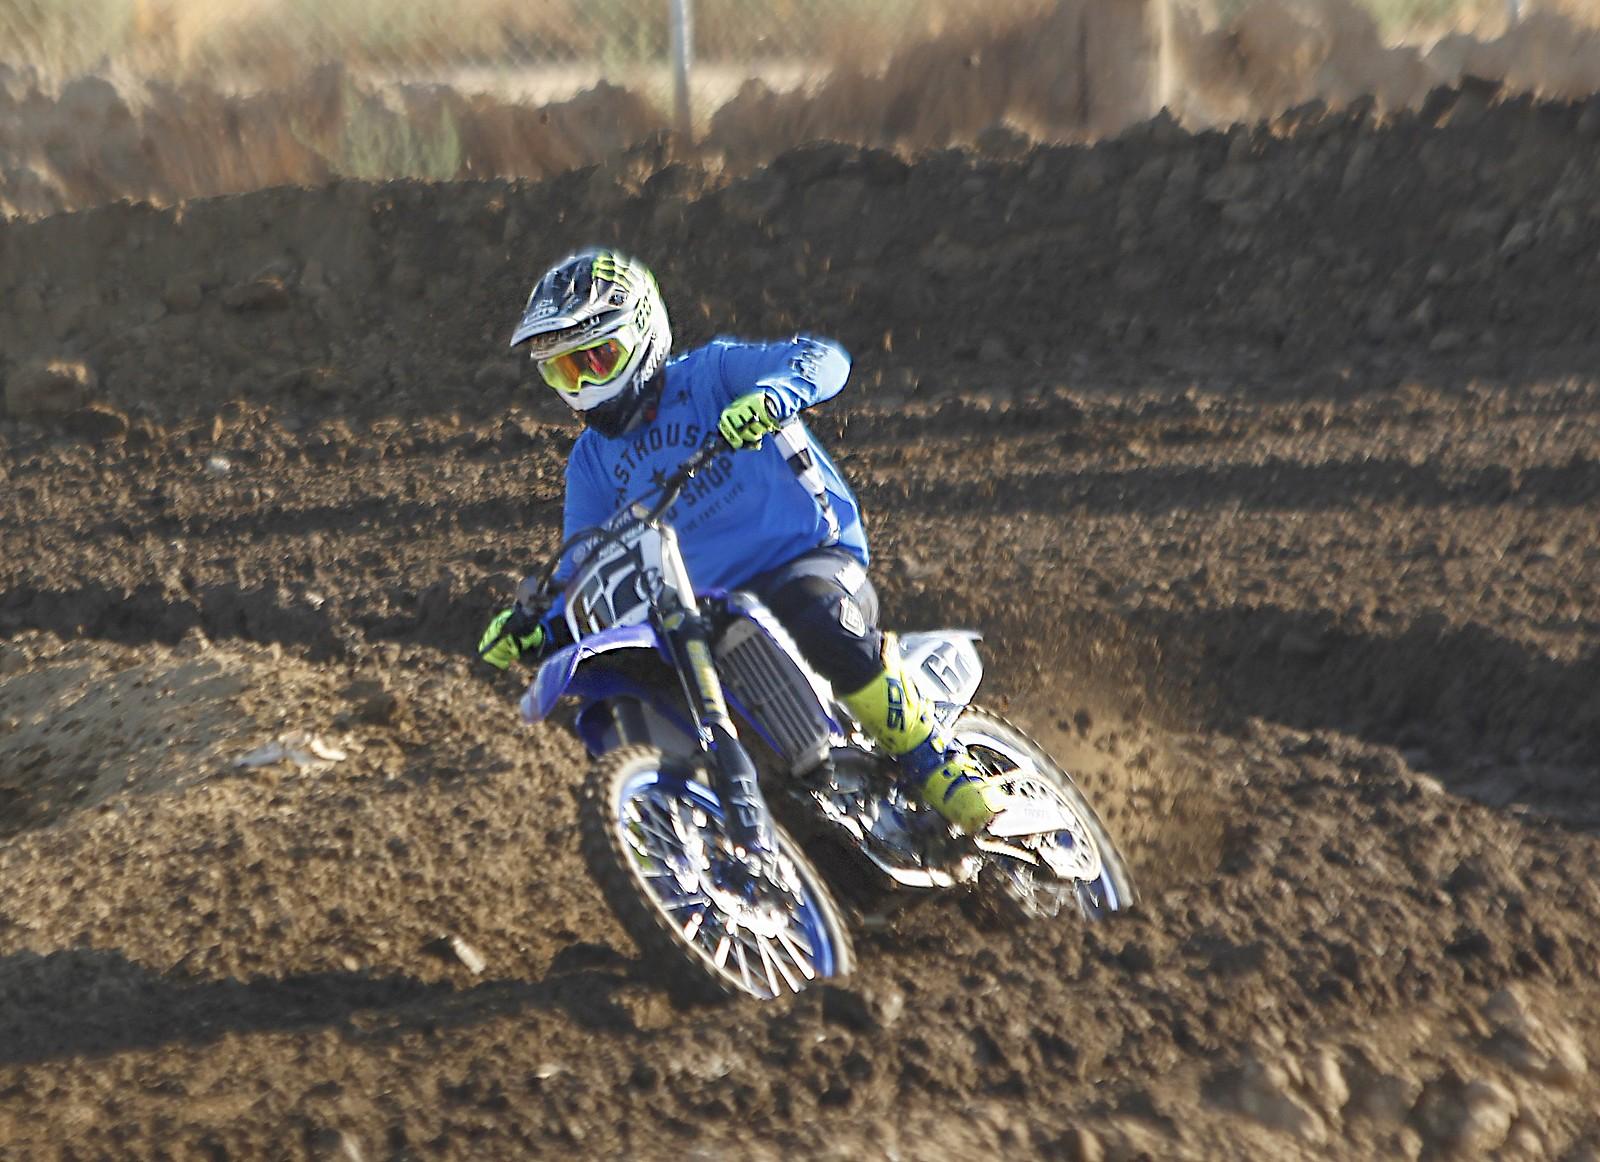 MG 5157 - moto67e - Motocross Pictures - Vital MX